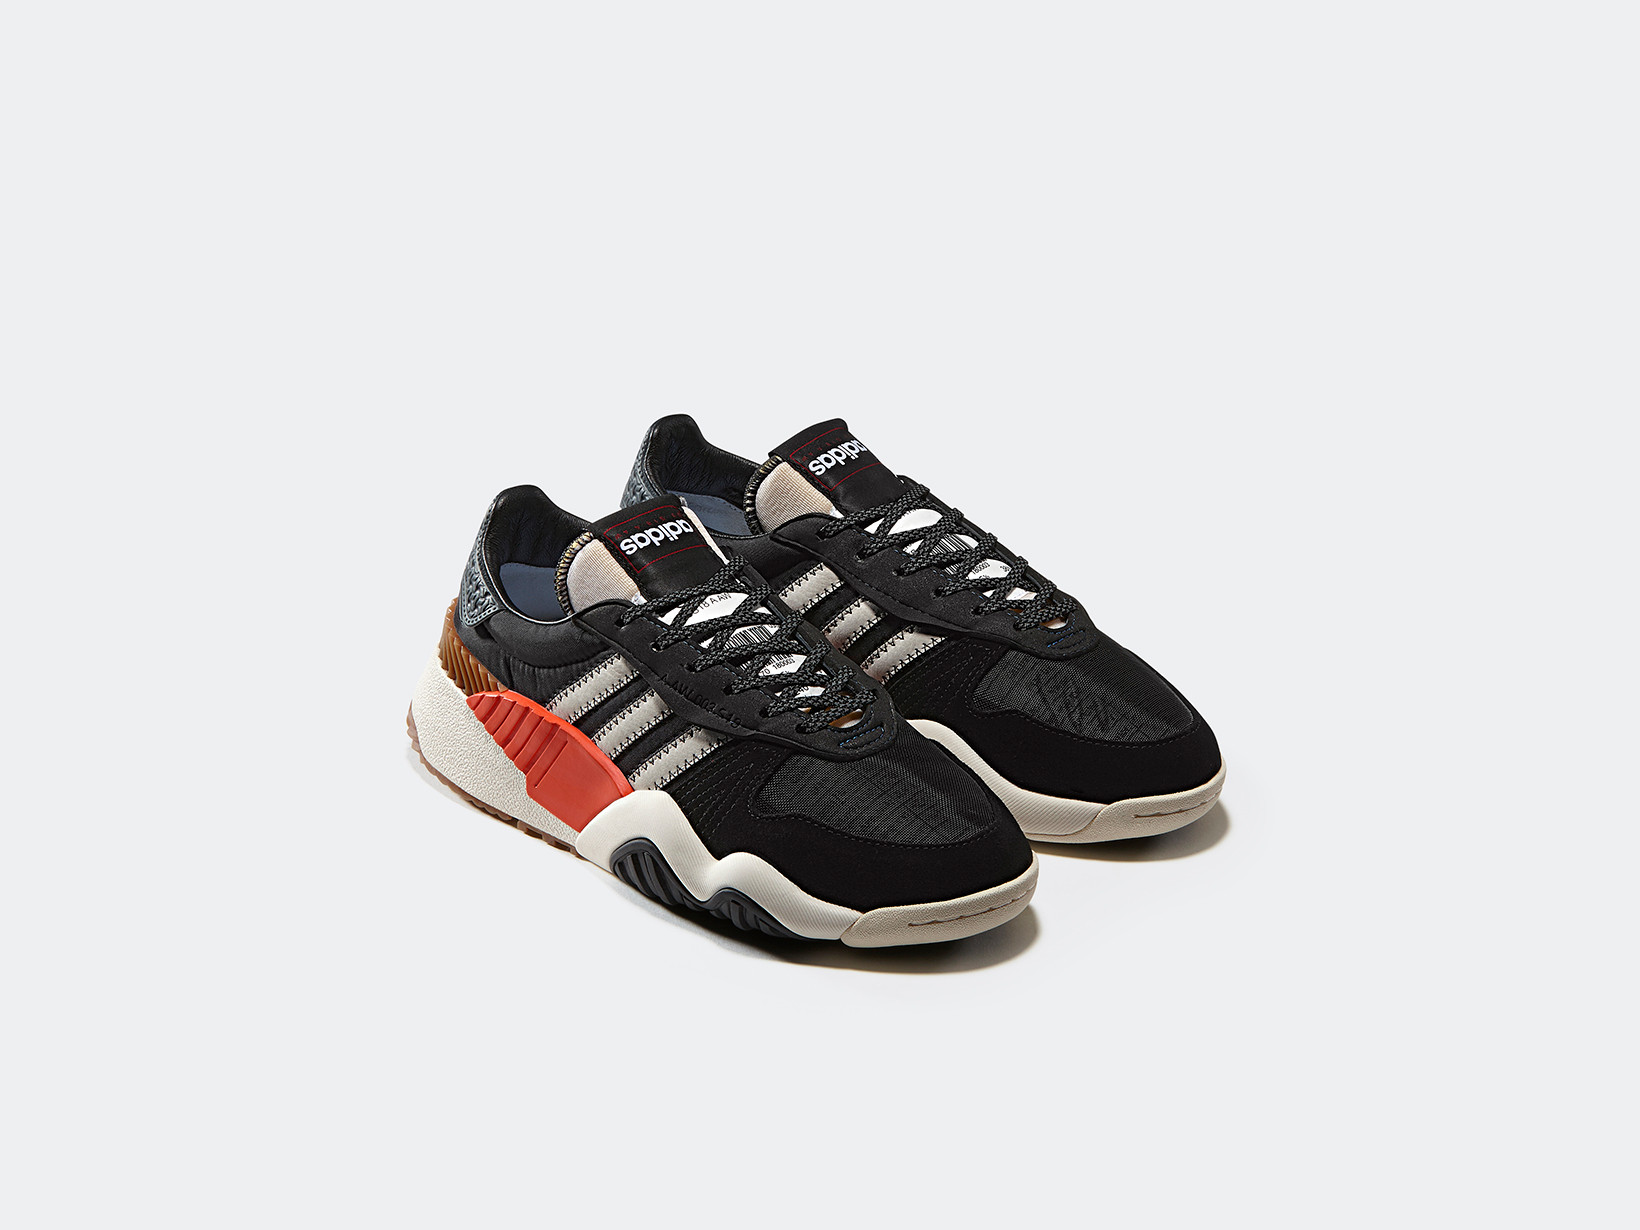 https---hypebeast.com-image-2018-06-adidas-originals-alexander-wang-season-3-drop-3-27